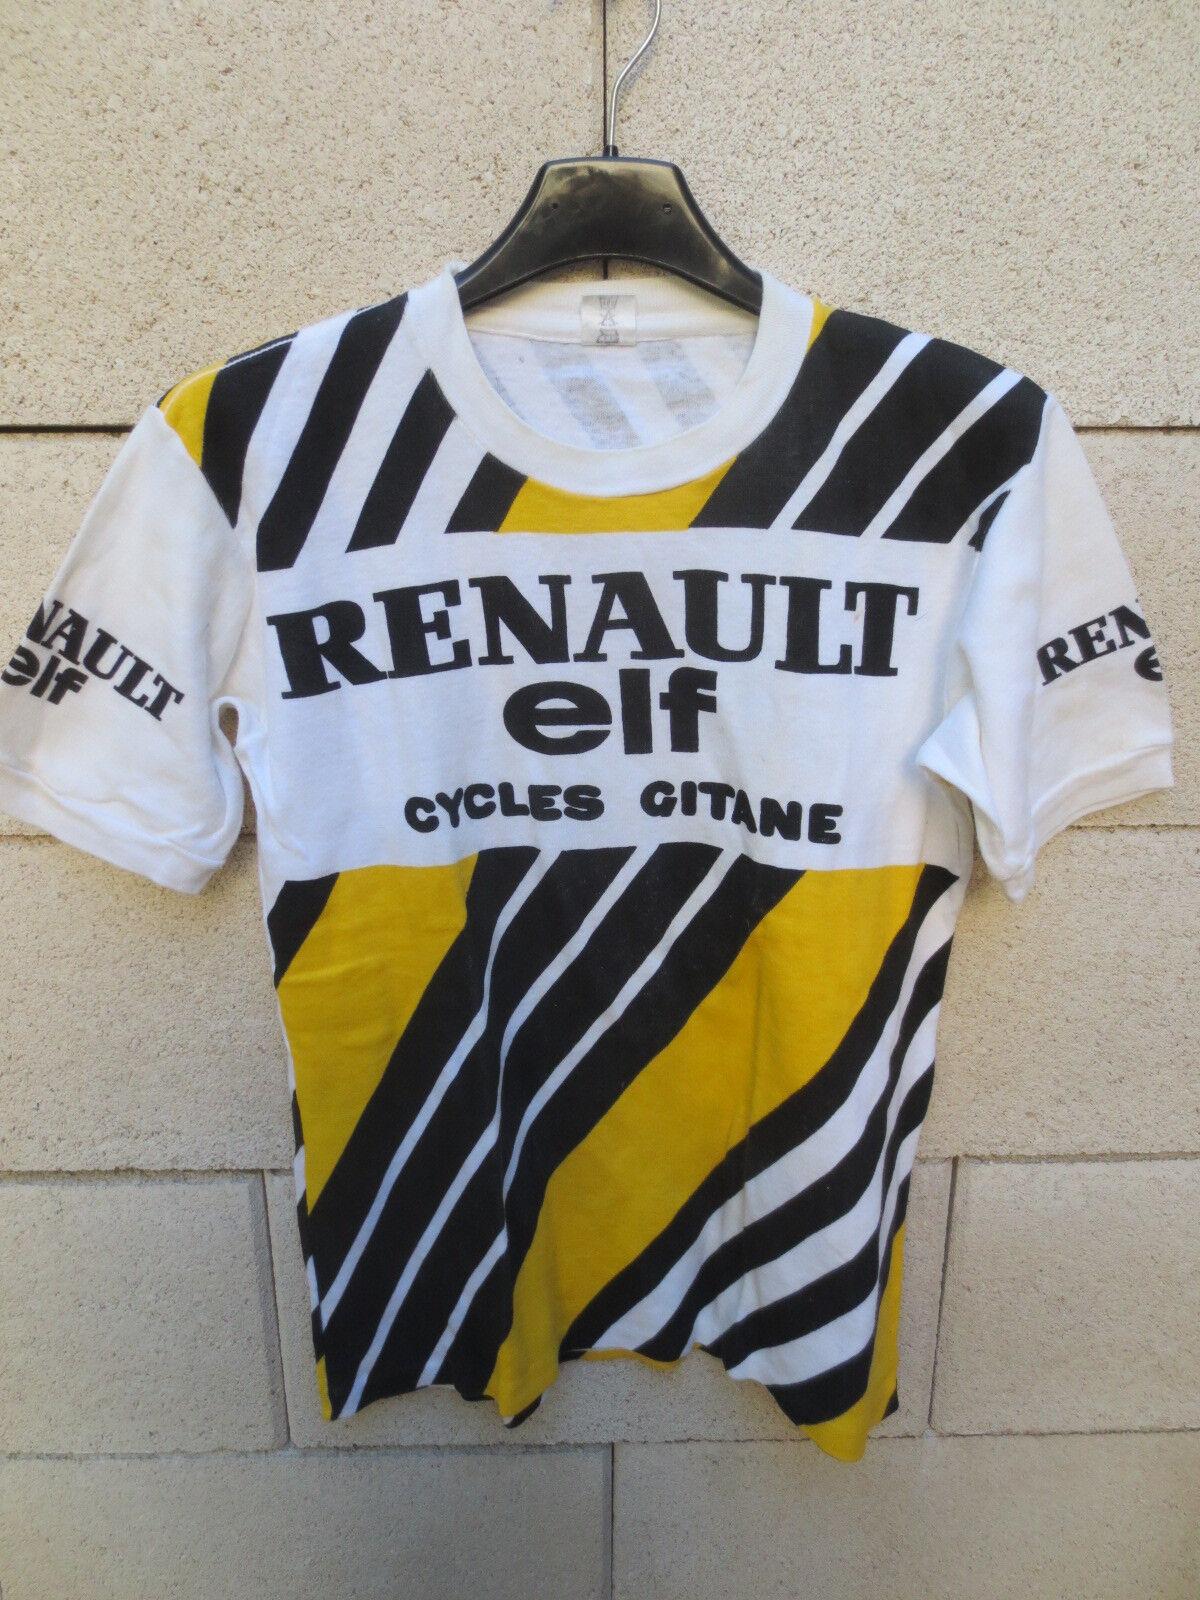 Maillot  T-Shirt RENAULT ELF GITANE vintage cycliste Tour France 1981 S Hinault  alta calidad general